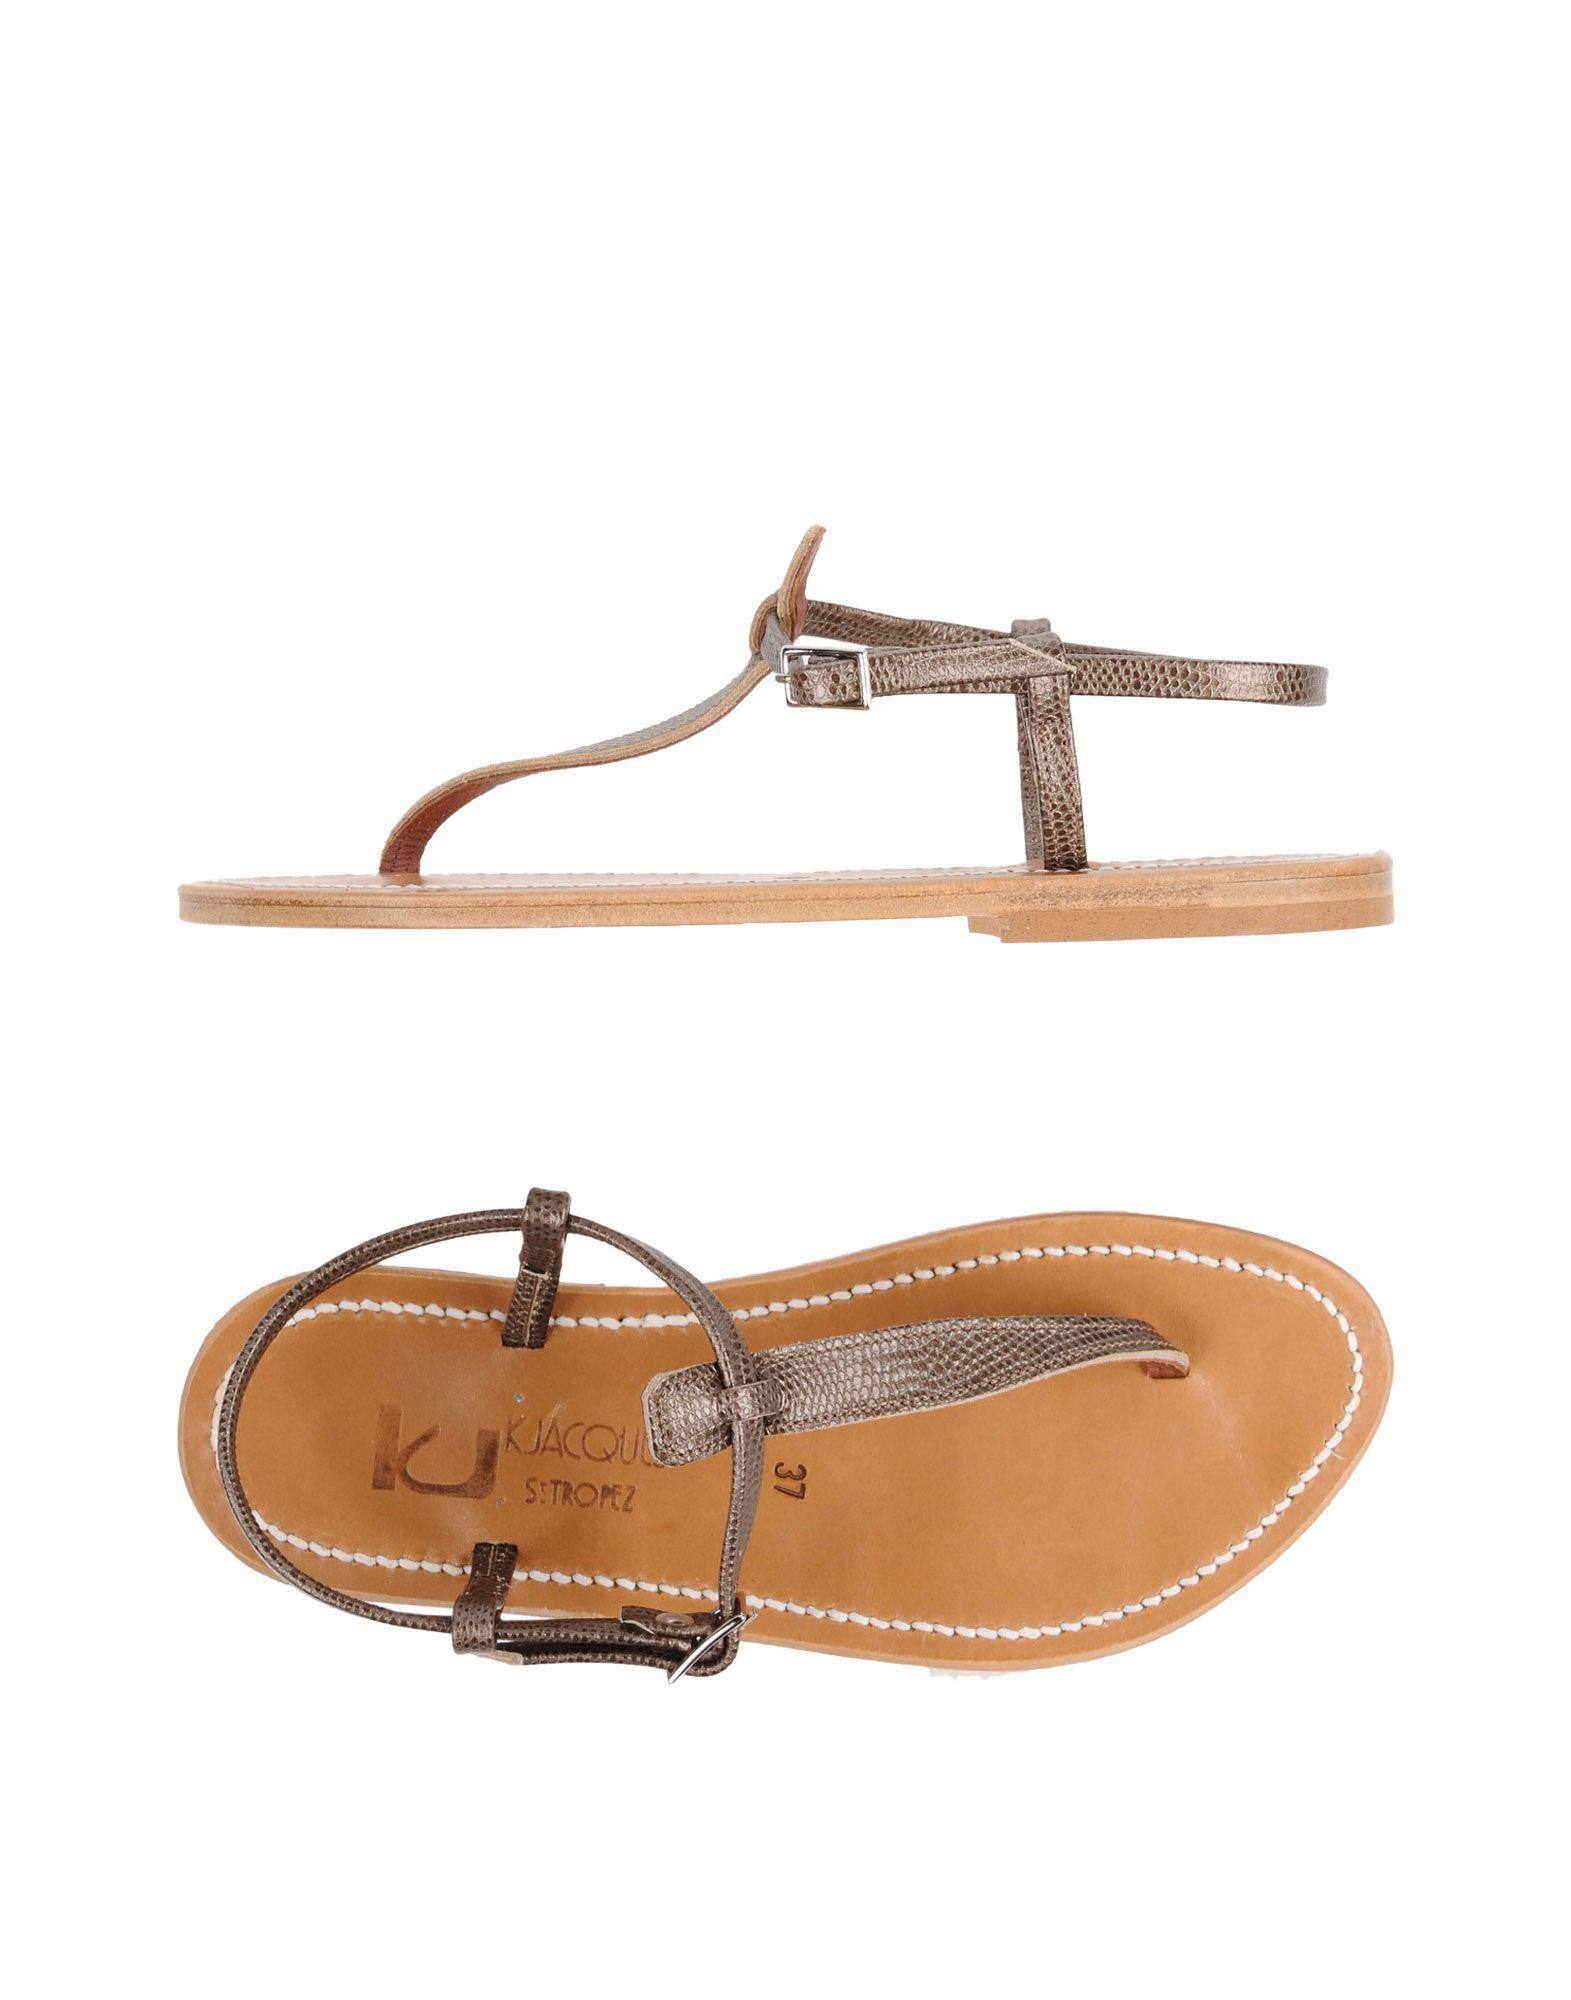 K.jacques  Flip flops